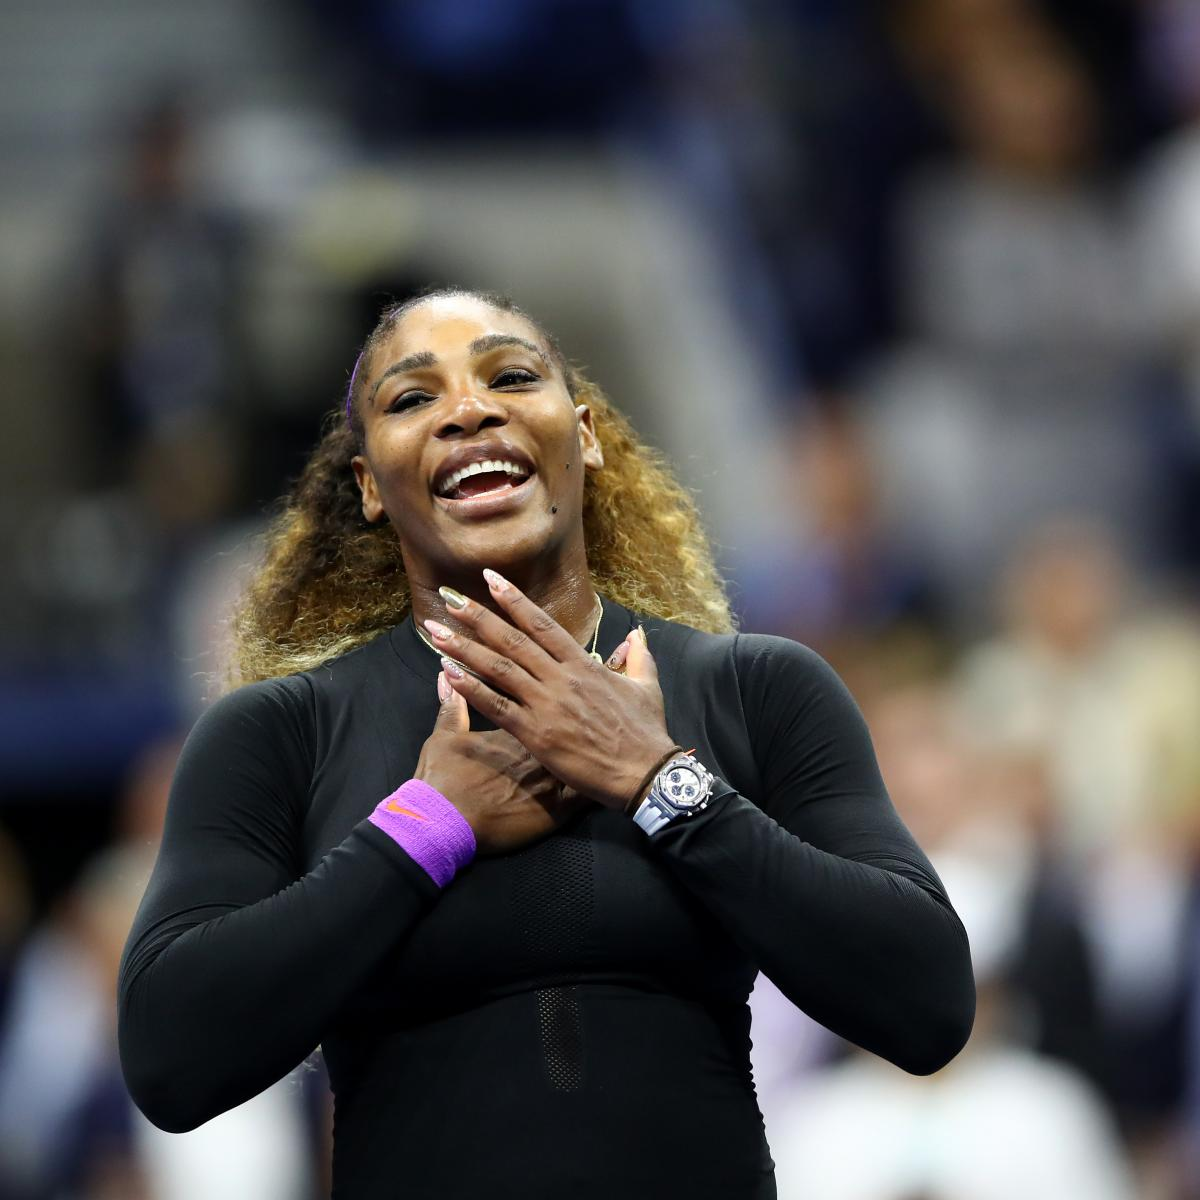 US Open Tennis 2019 Women's Final Schedule, Prediction and Prize Money